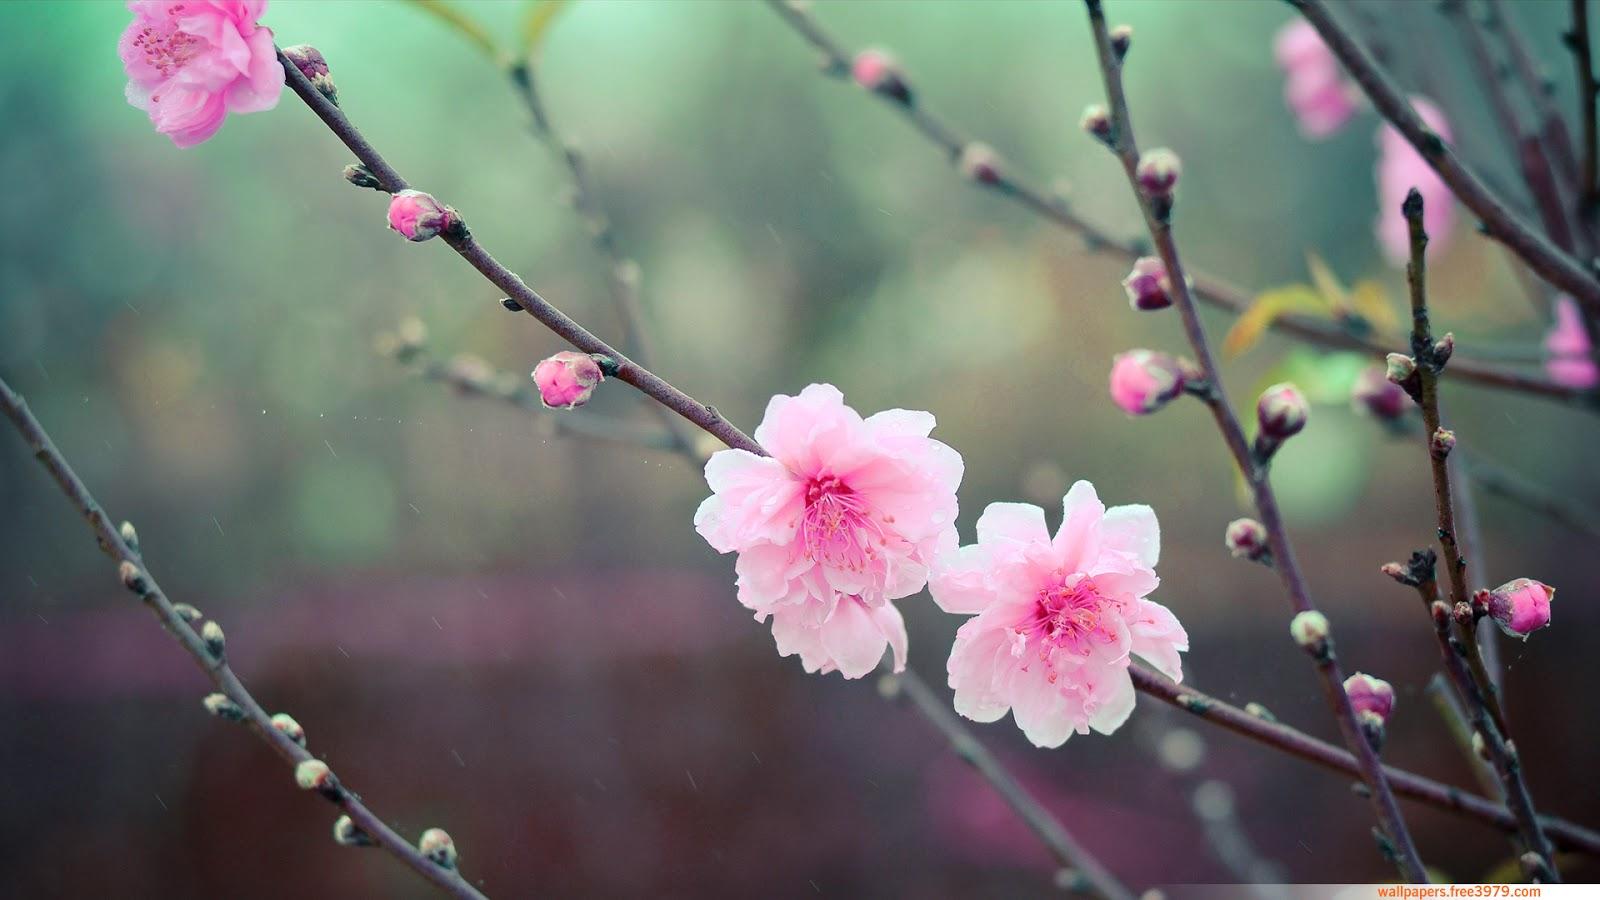 Wallpapers-Wallpaper: 20+ Asian Cherry Blossom Flower